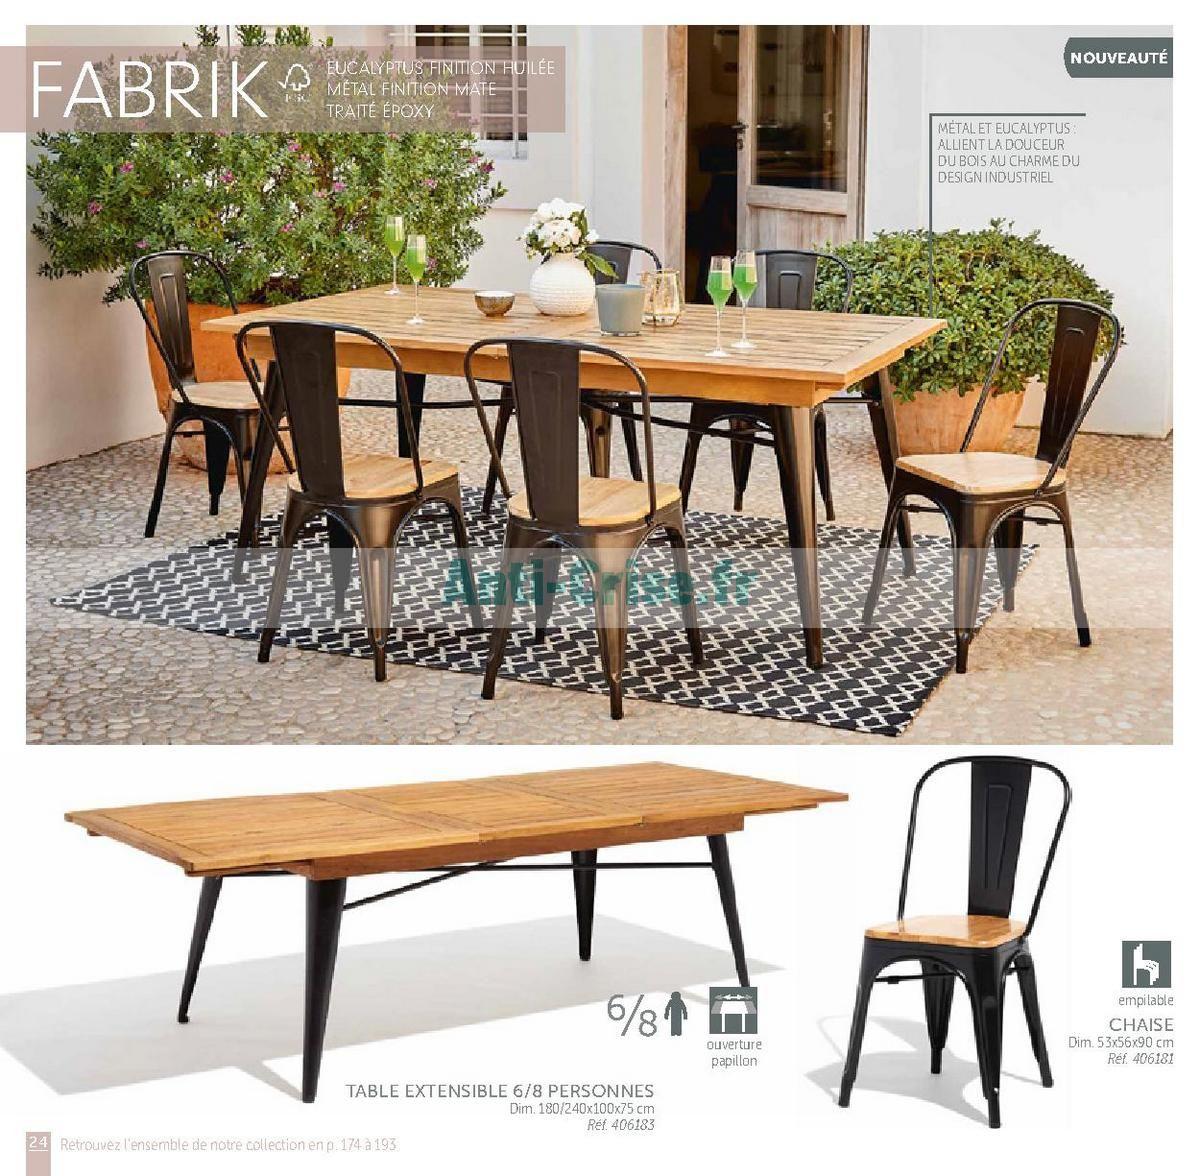 Table Mobilier Chaise Recherche GoogleMeuble Et Gifi Fabrik dxhQtsrC